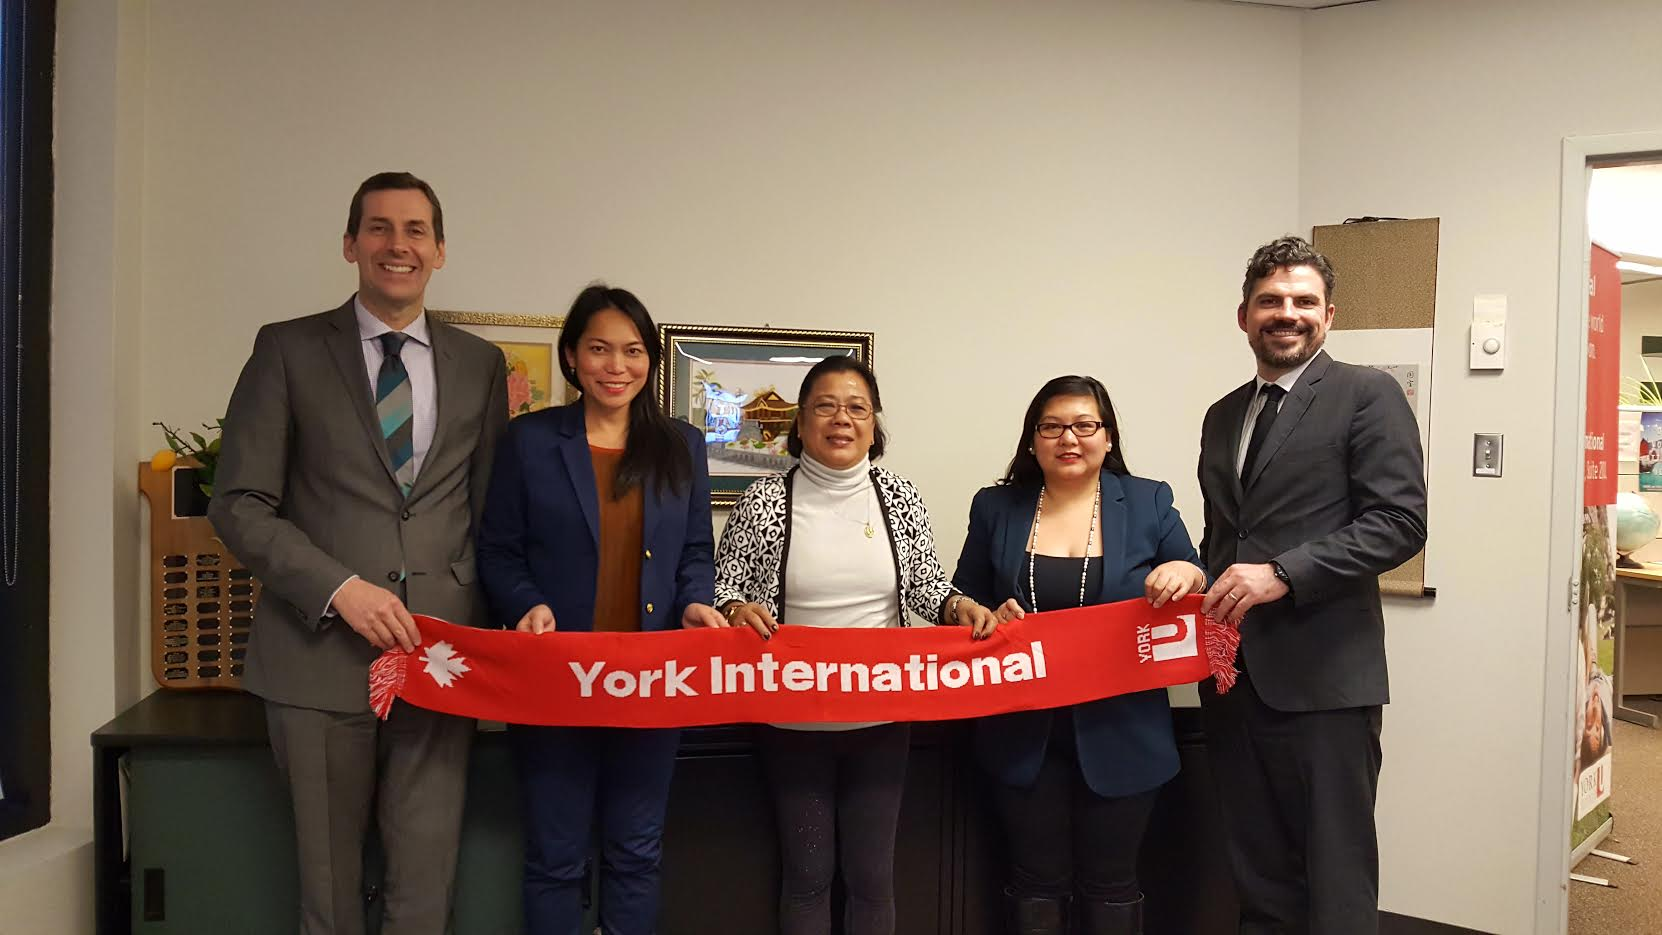 November 24, 2016 York International, YUELI and Development Academy of the Philippines